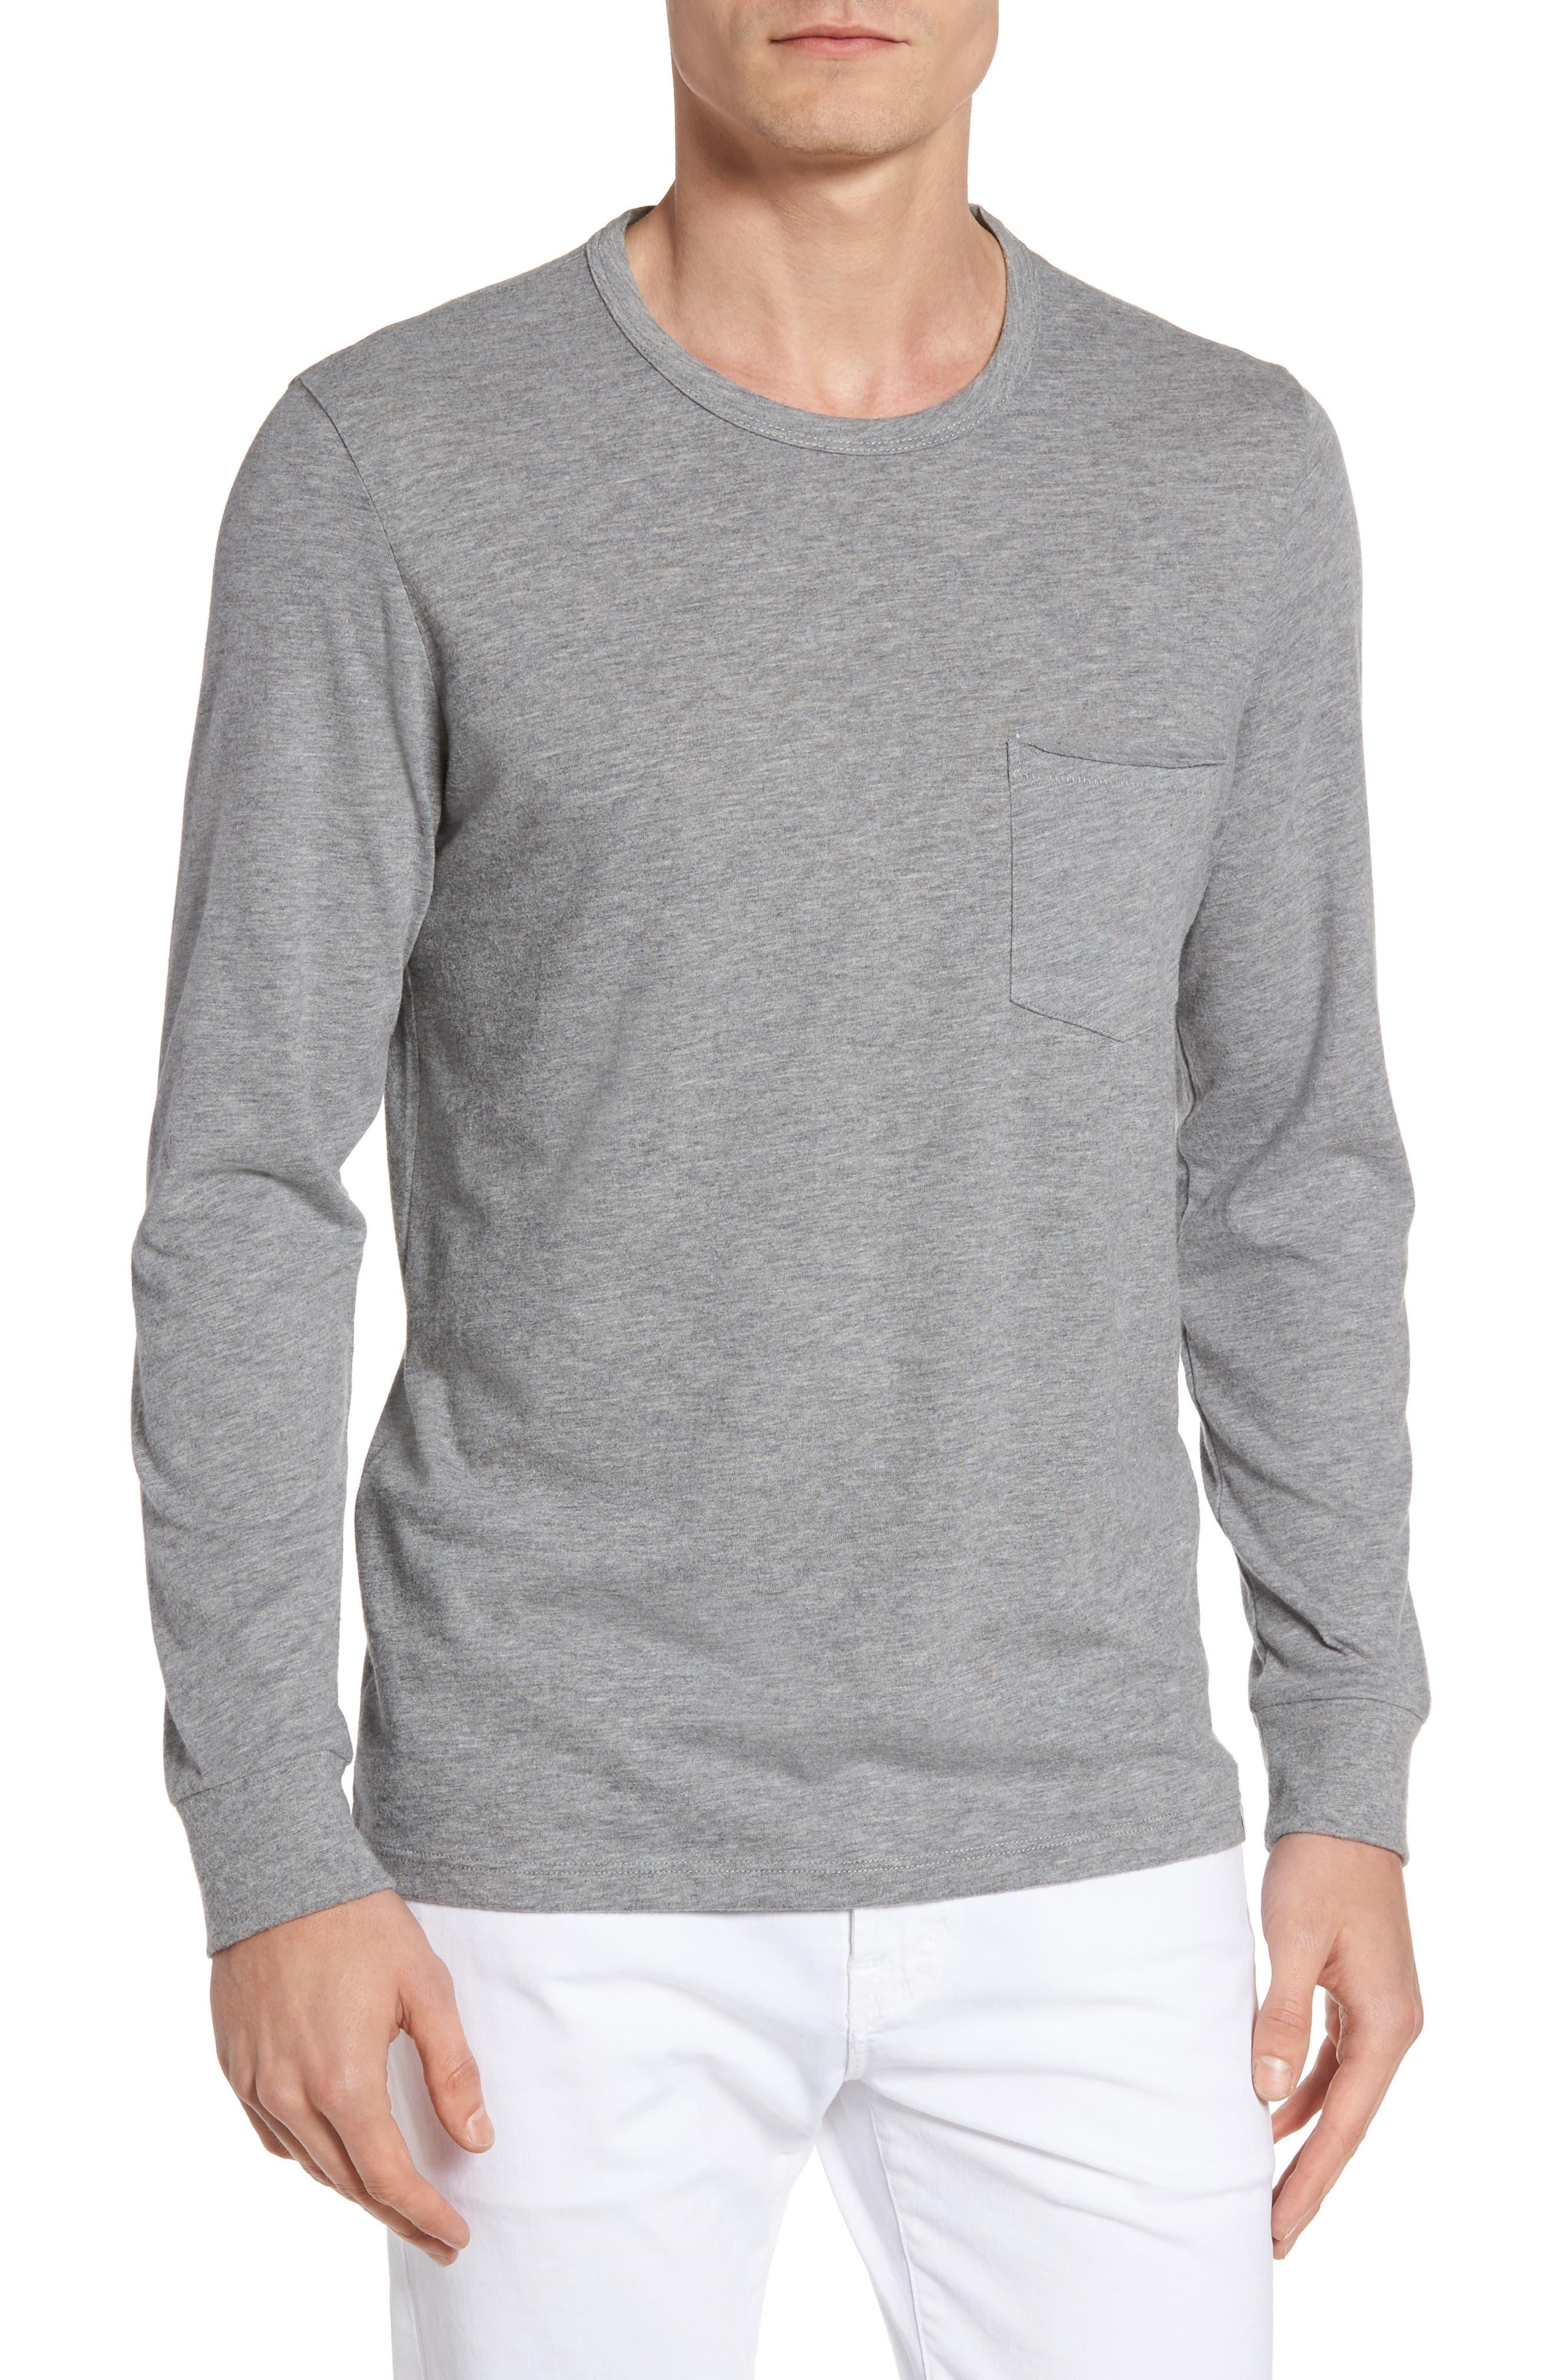 Jason Scott Yale Long Sleeve Pocket T-Shirt